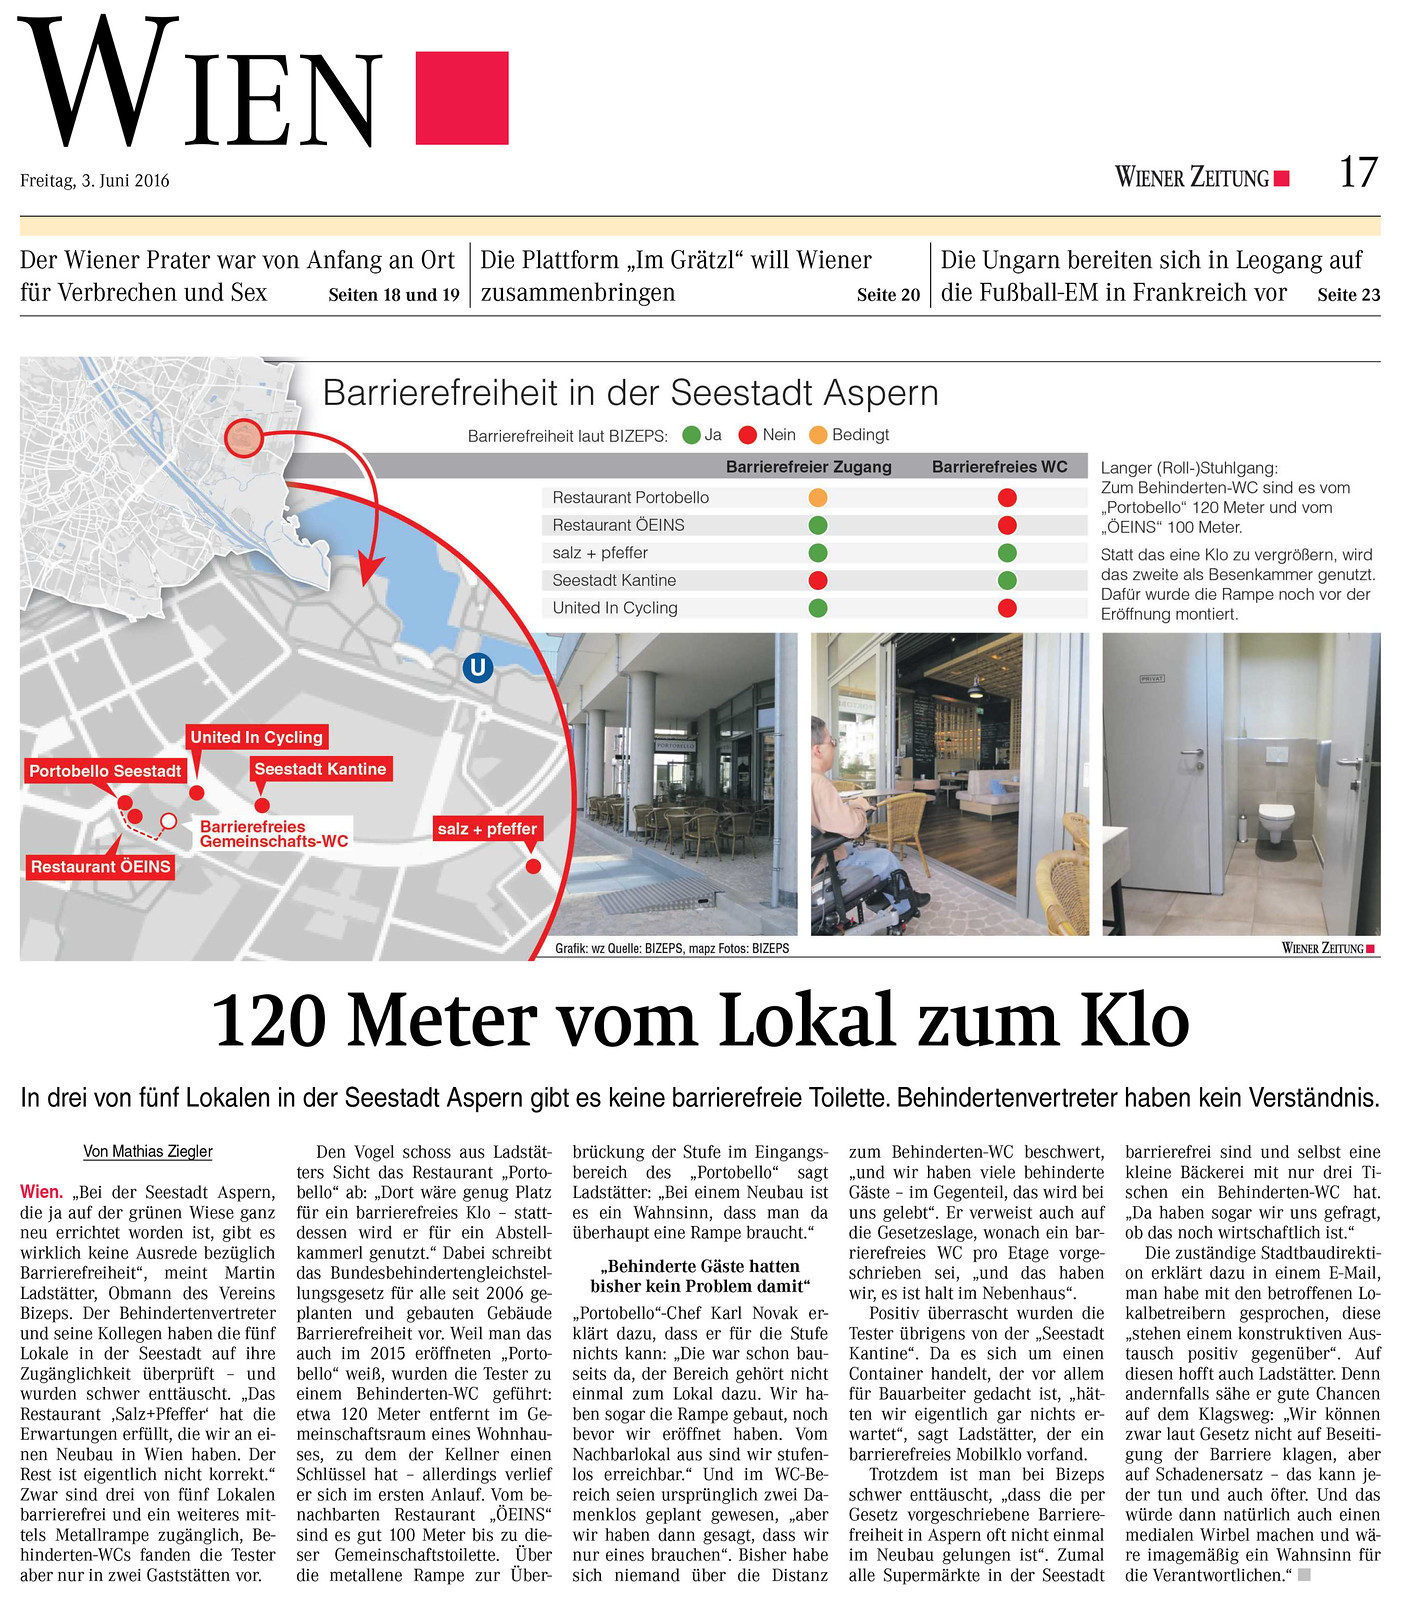 Wiener Zeitung: 120 Meter vom Lokal zum Klo